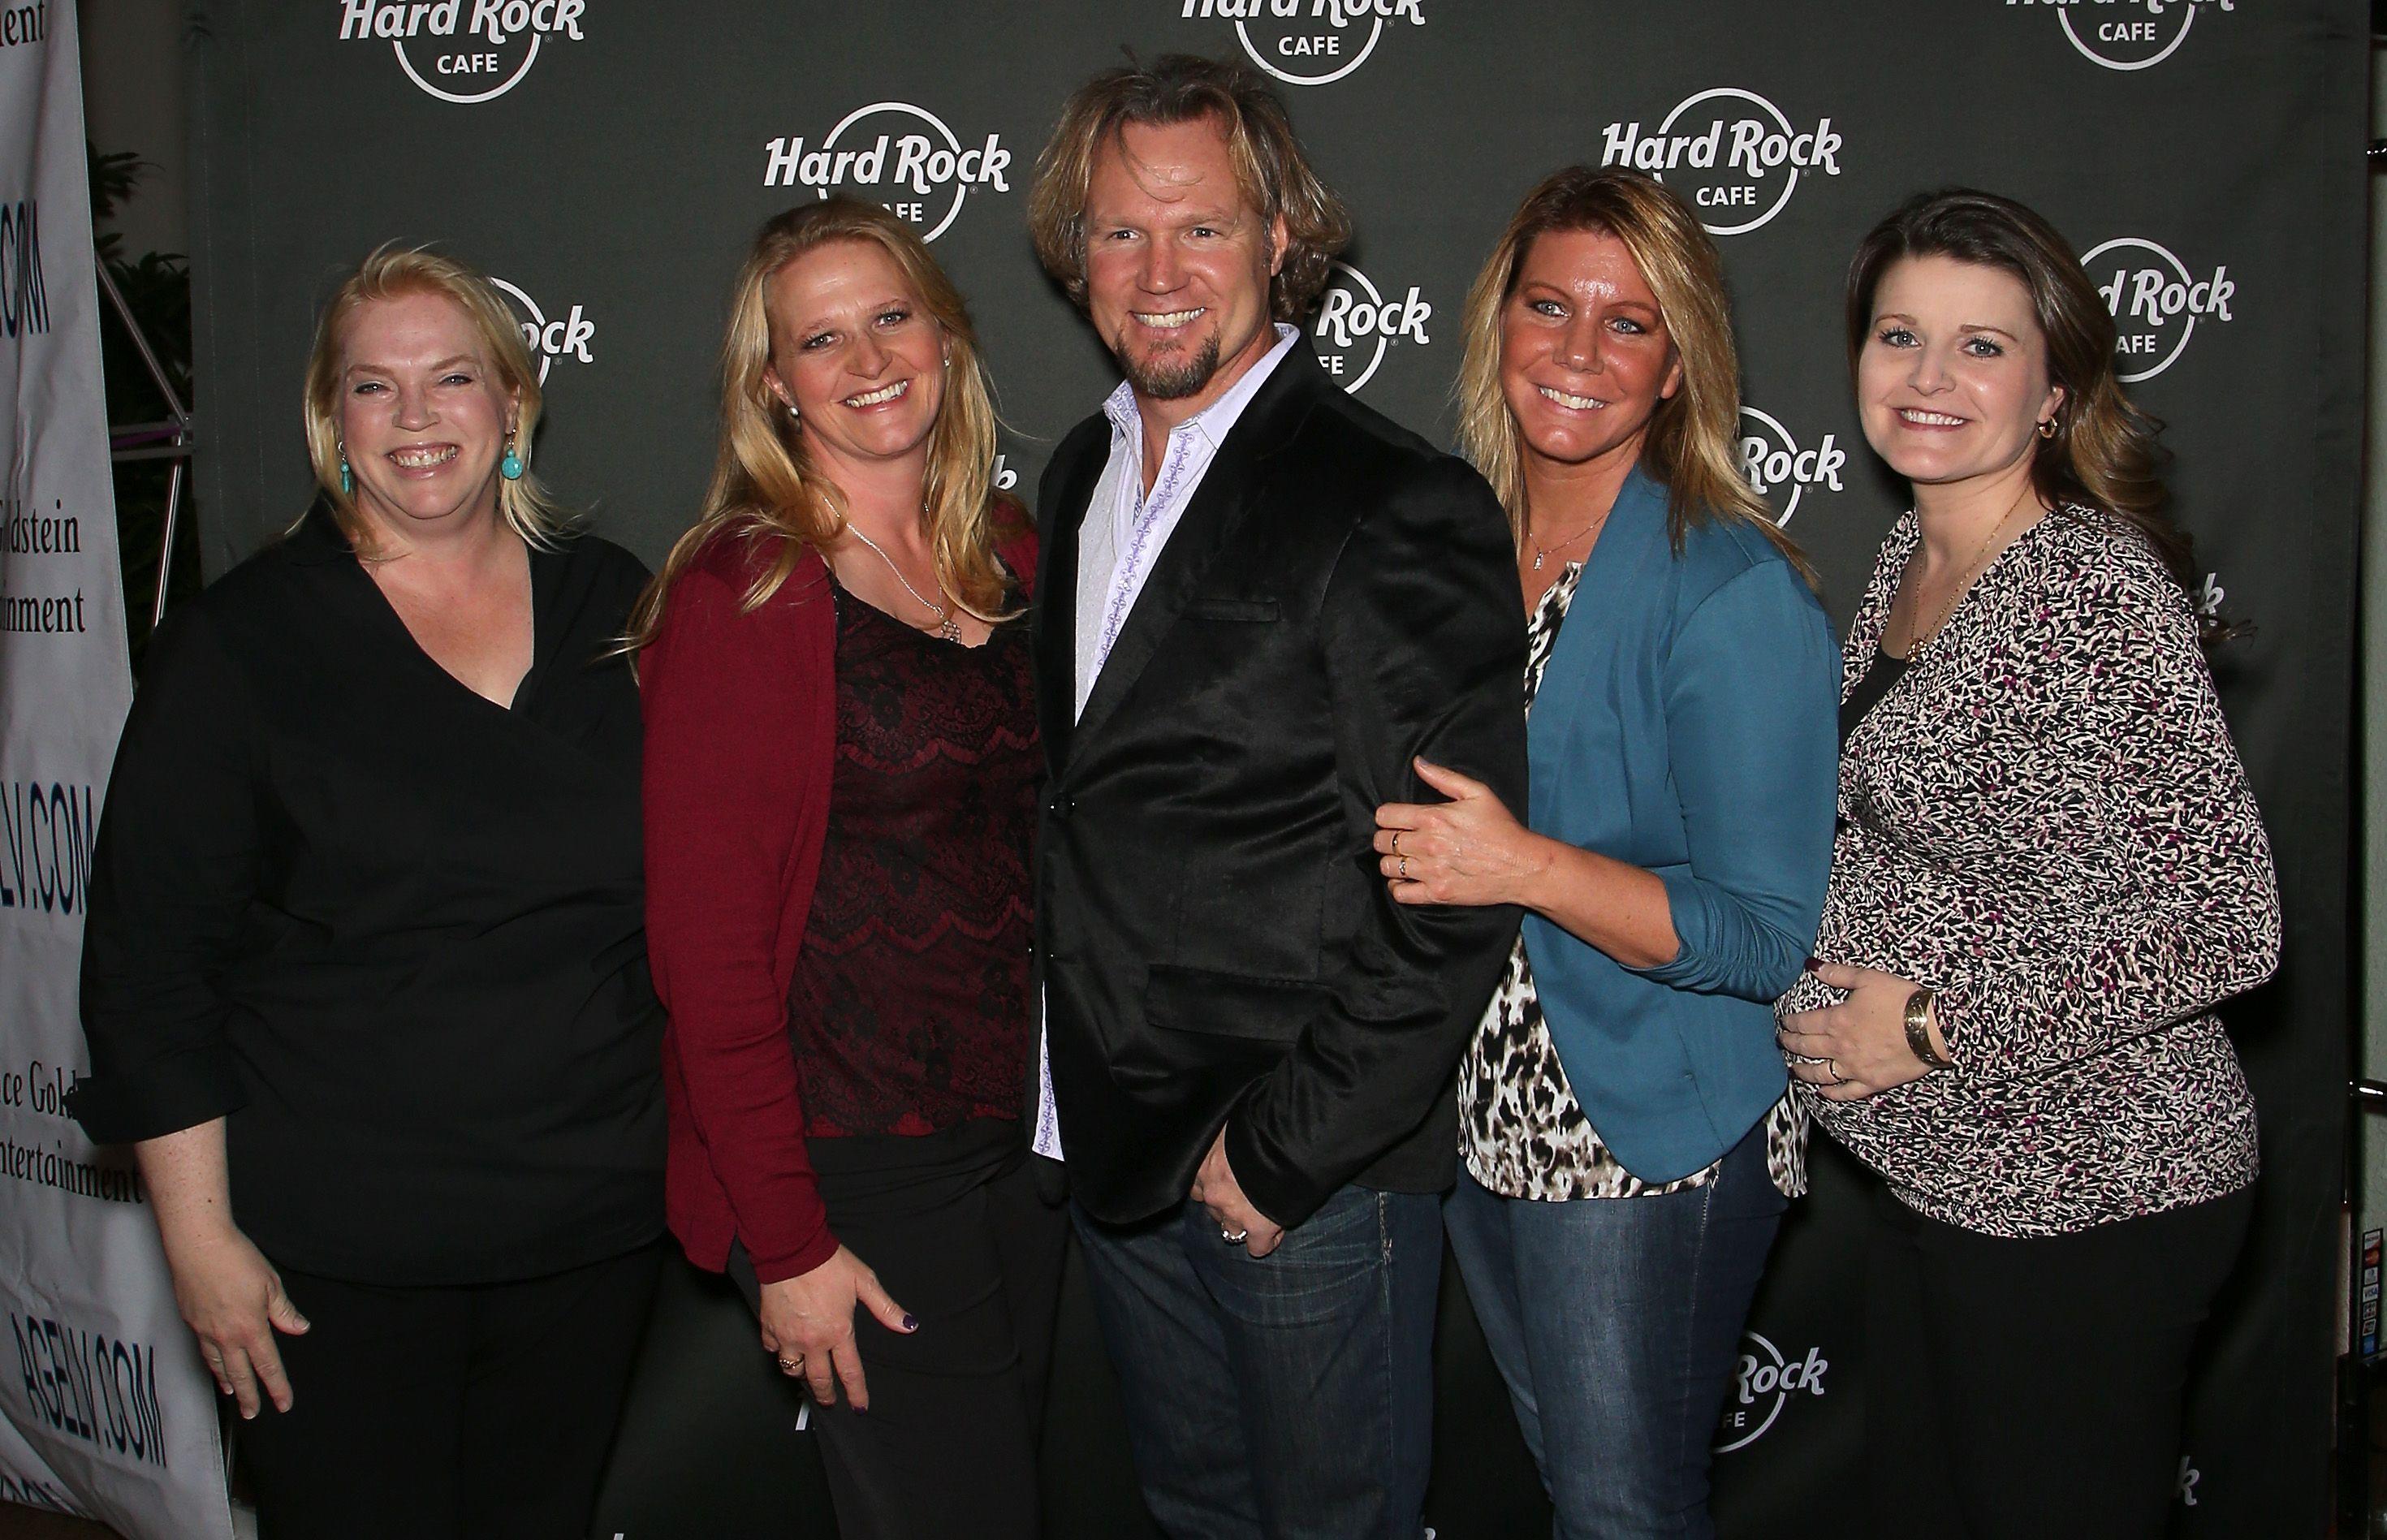 Janelle, Christine, Kody, Meri, and Robyn Brown